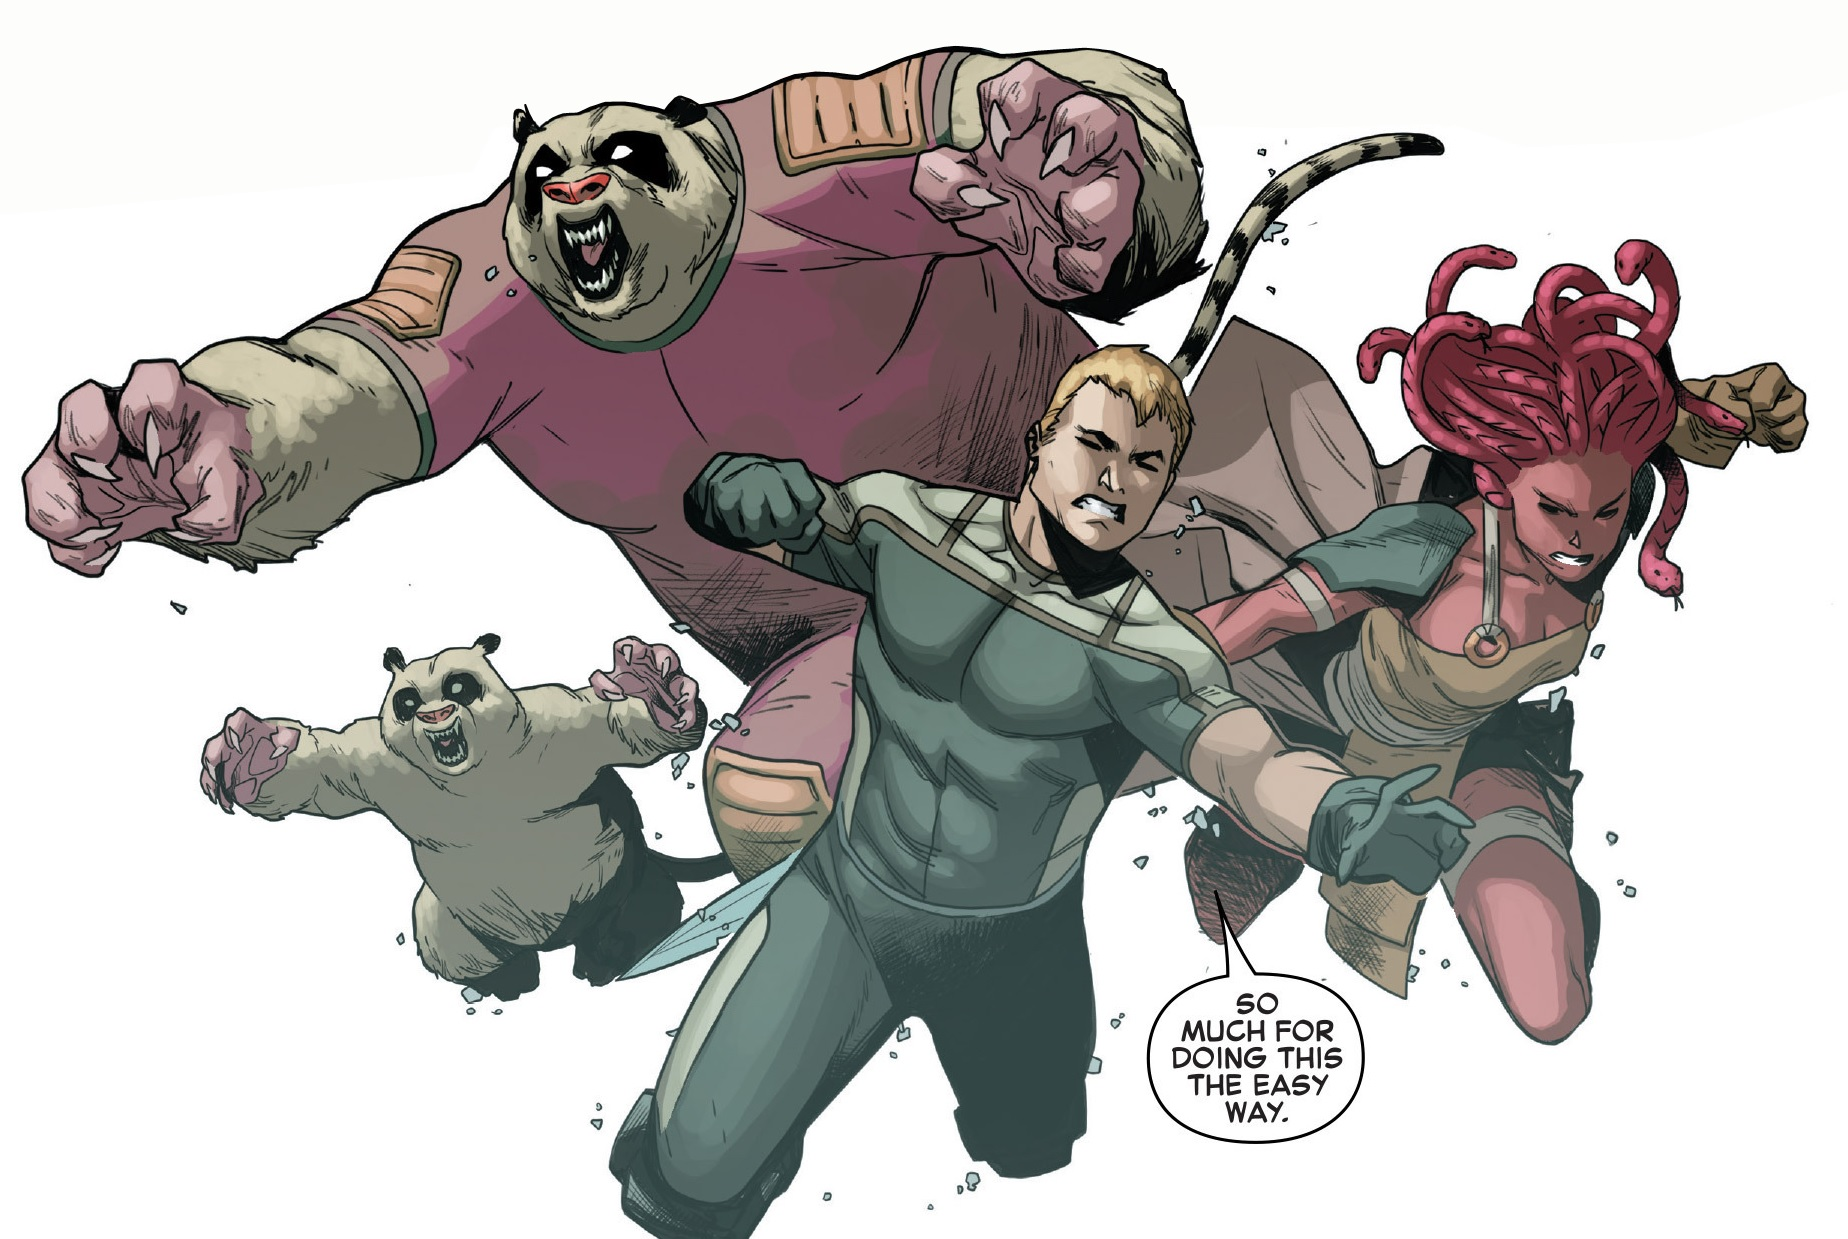 Eugene Thompson (Earth-616), Pik Rollo (Earth-616), Hilla (Earth-616) and Iqa (Earth-616) from Venom Space Knight Vol 1 10 001.jpg